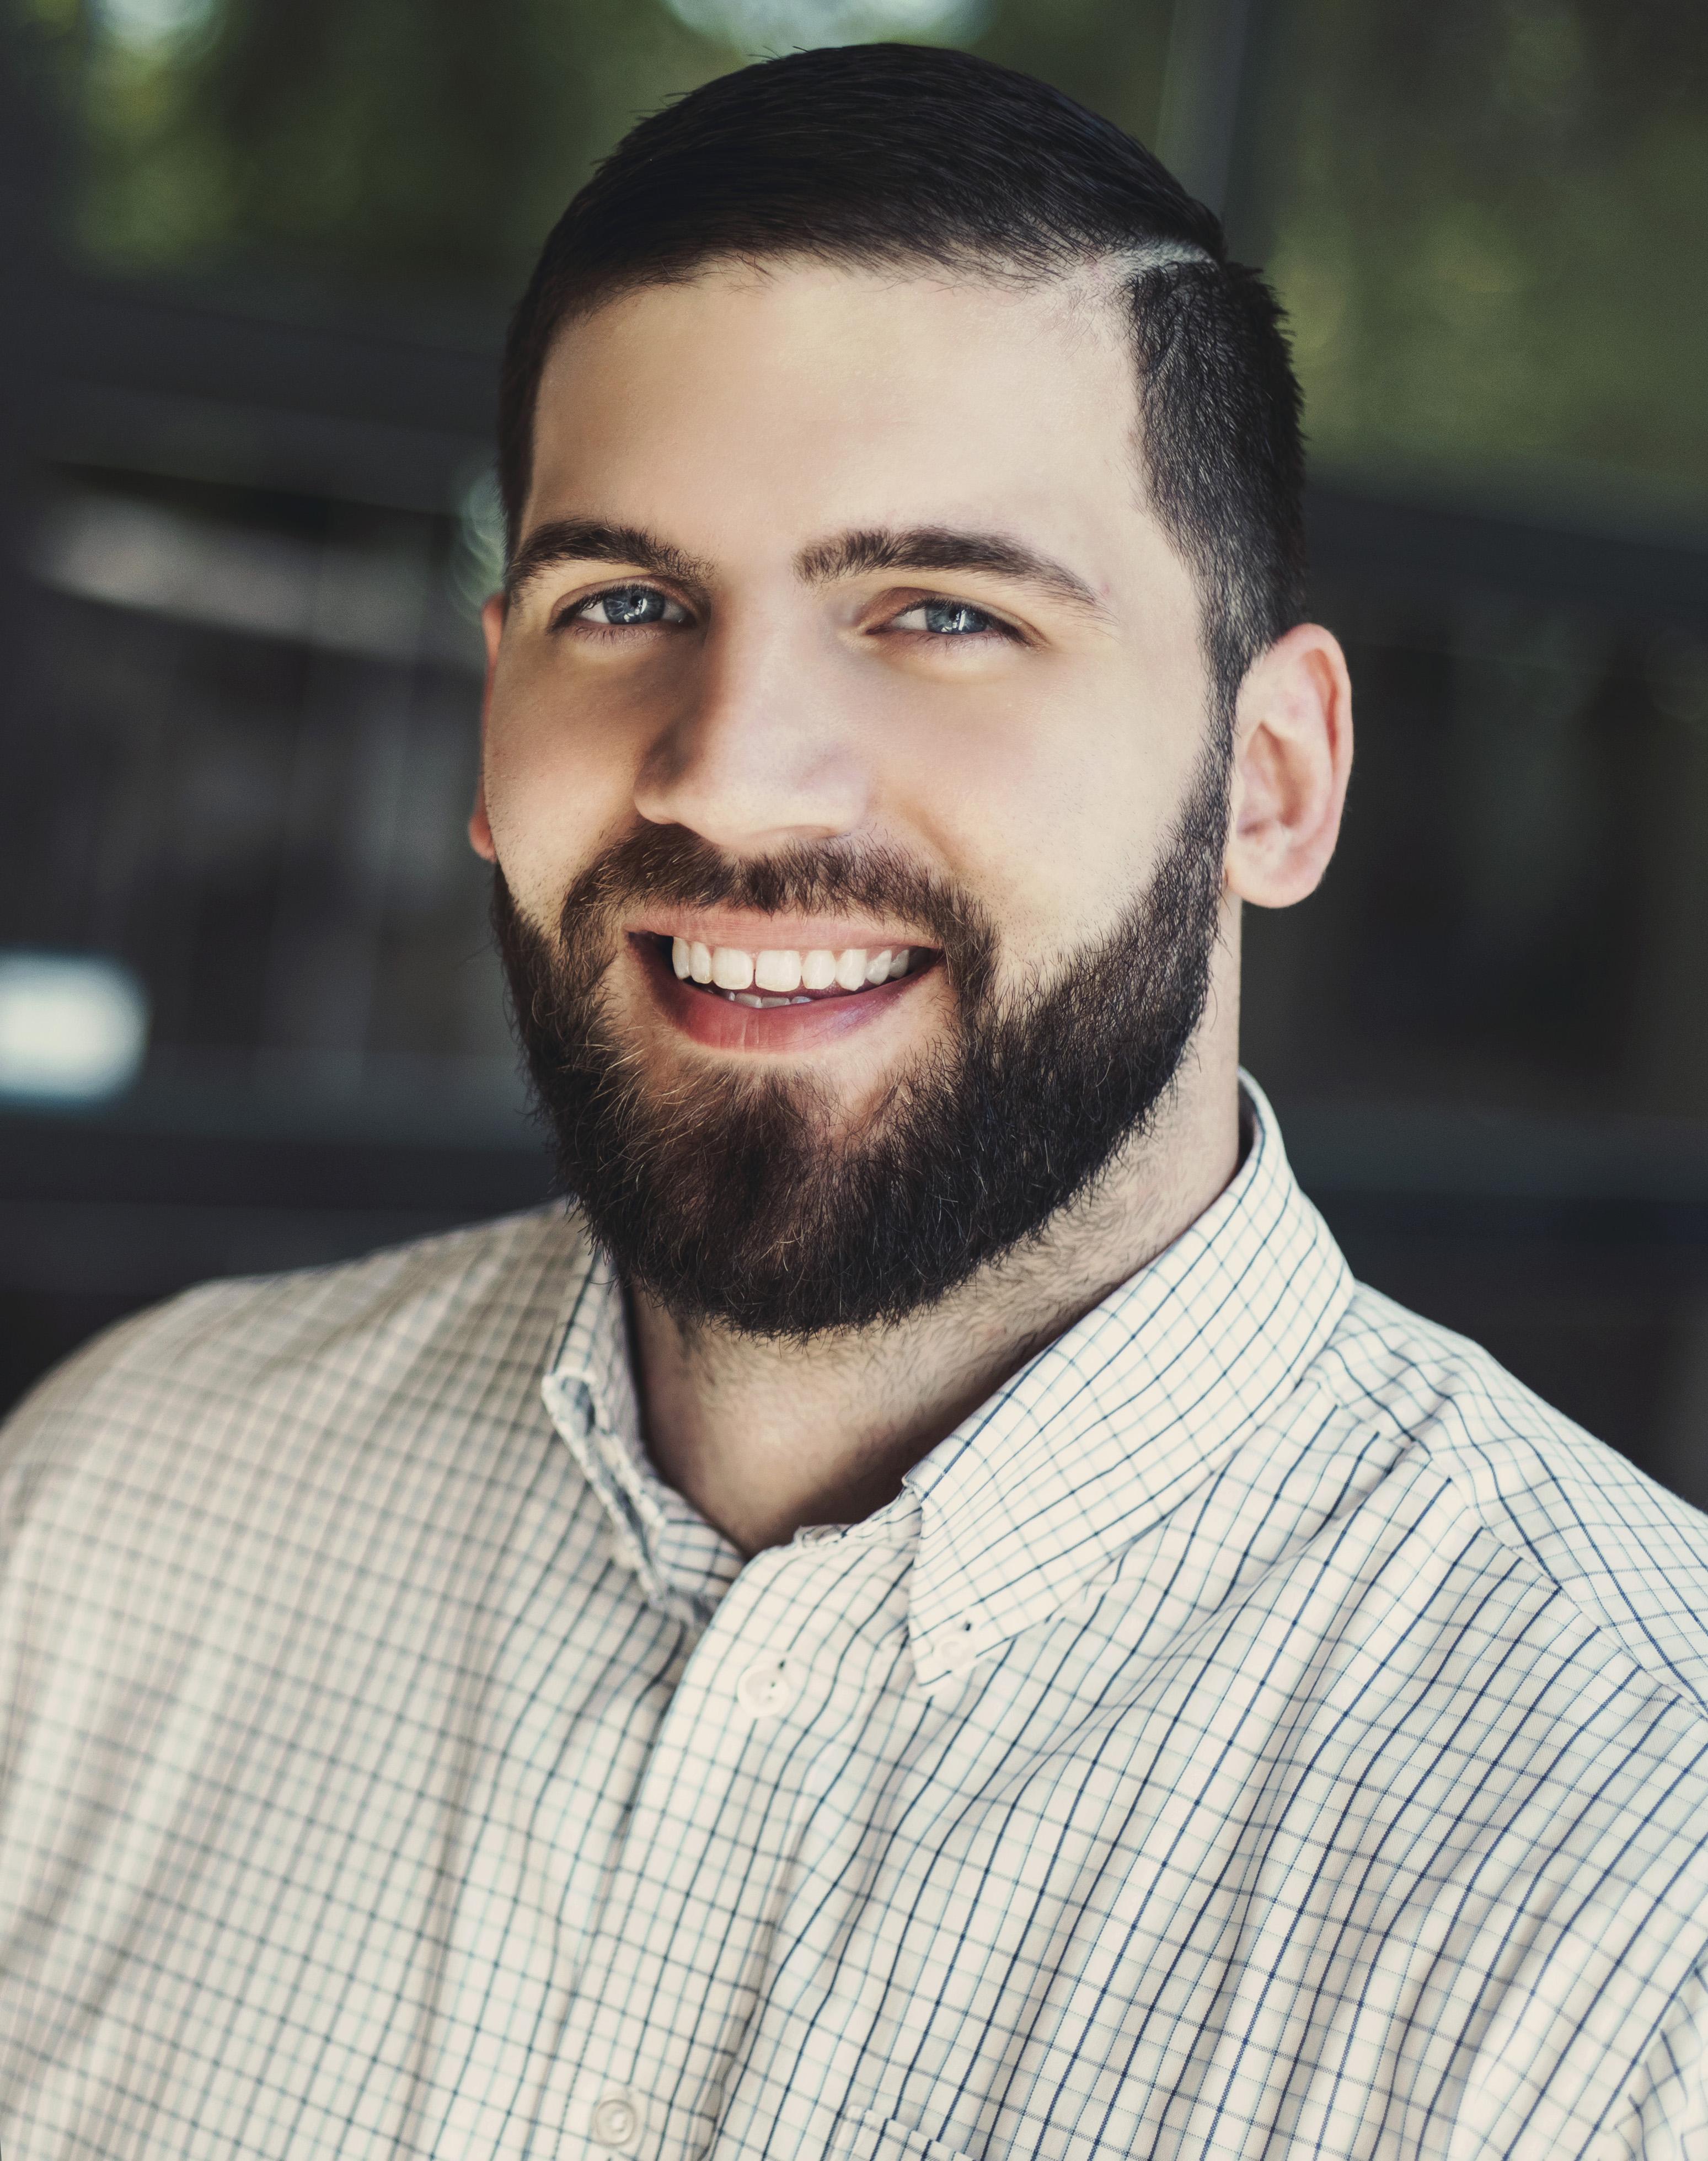 Ethan Morgan